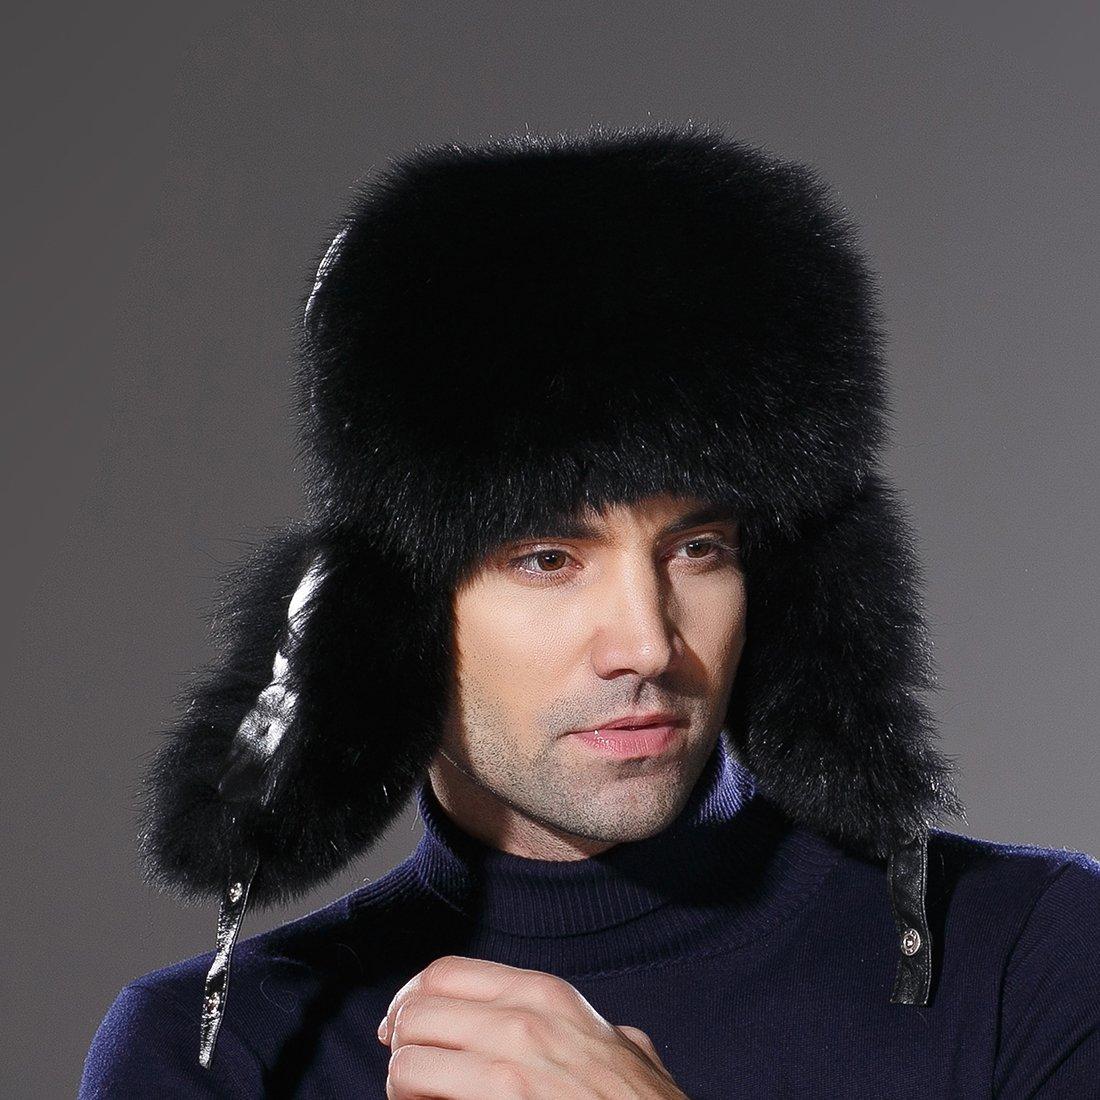 URSFUR Winter Russian Fur Hat Mens Real Fox Fur Ushanka Trapper Cap Black by URSFUR (Image #3)